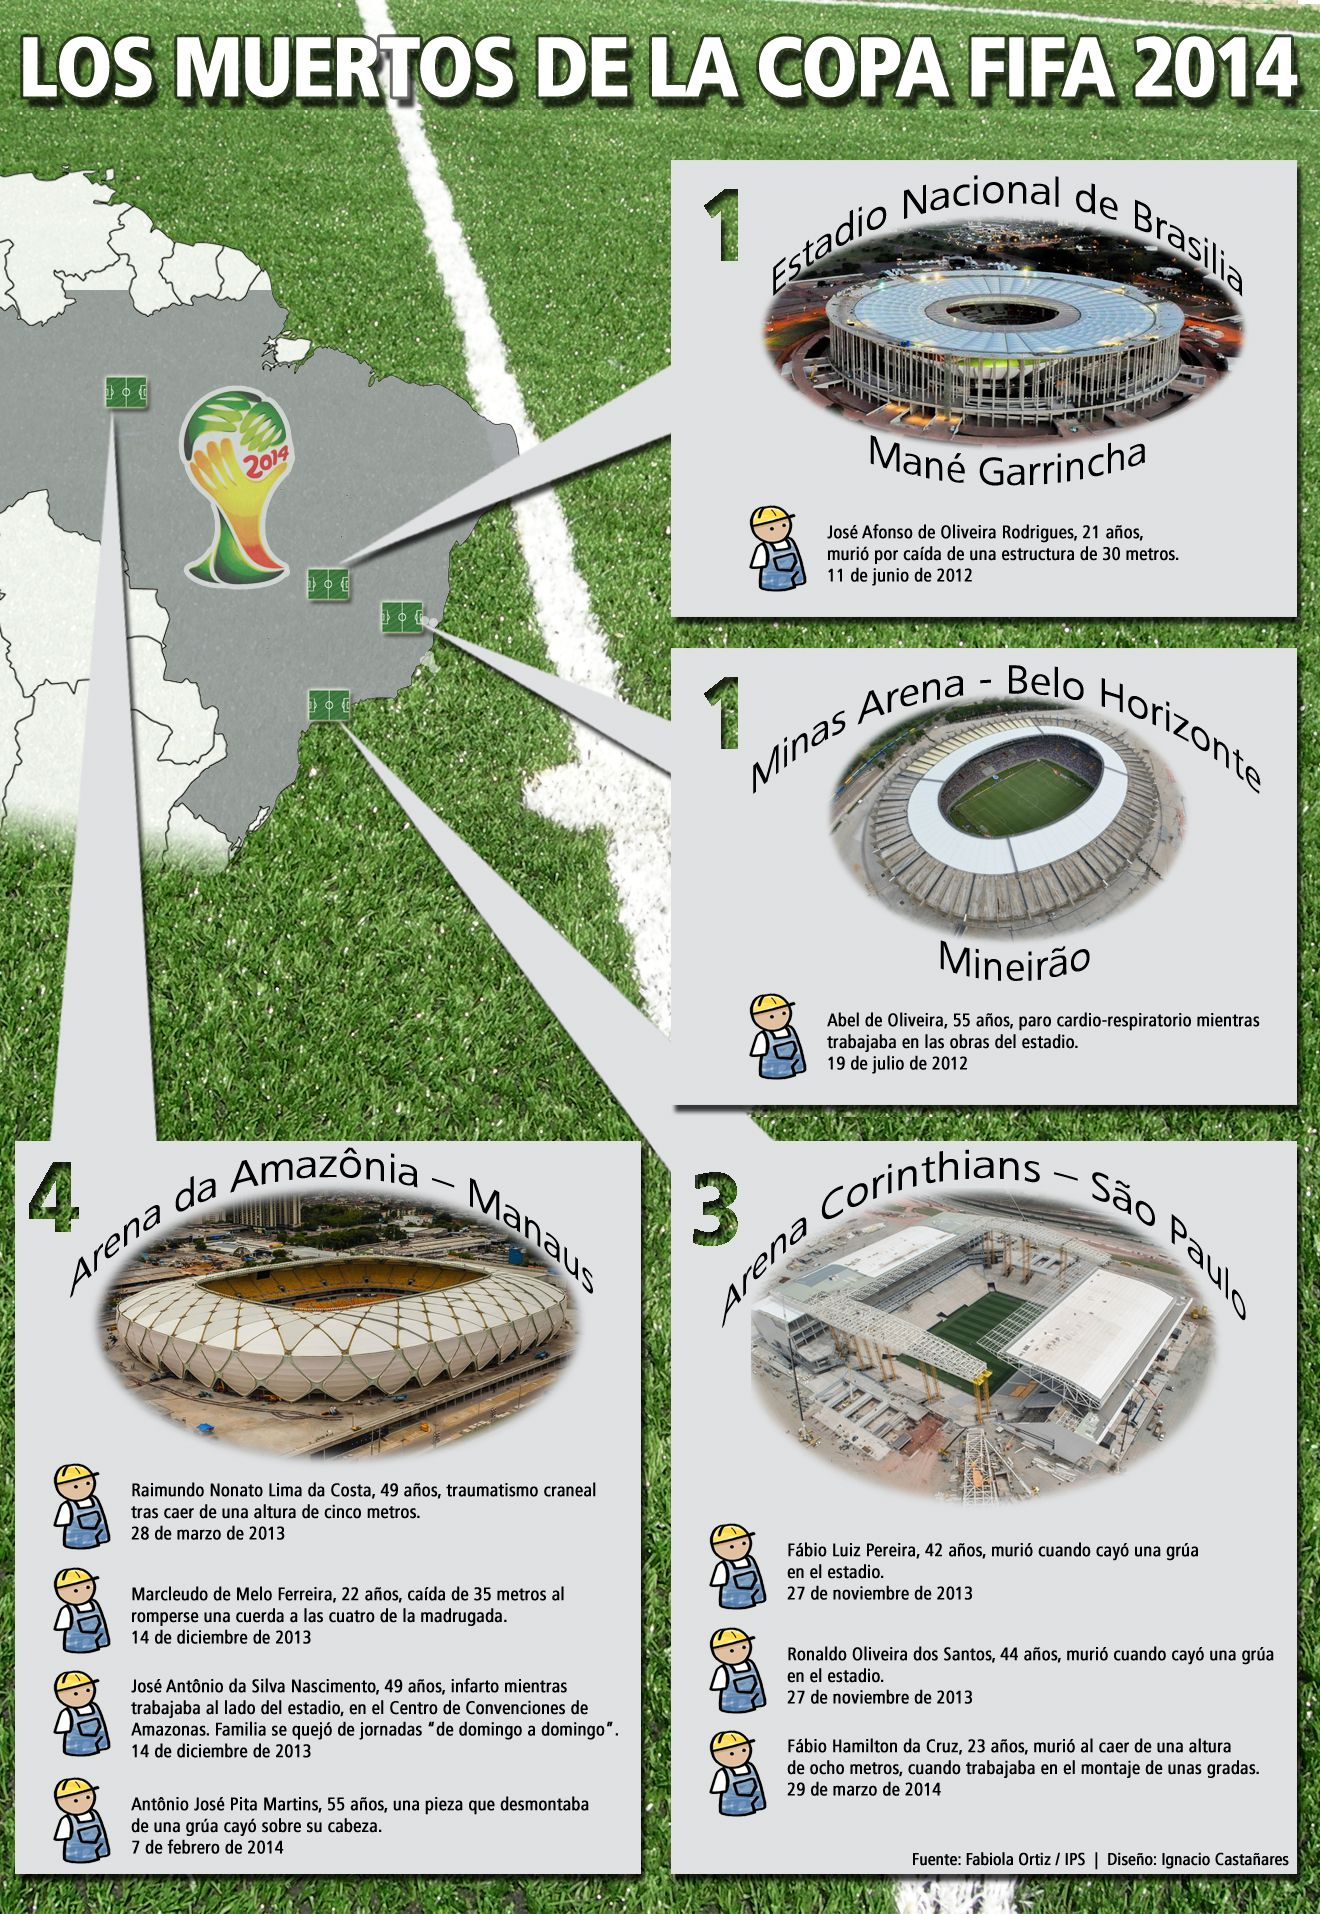 infografia-los-muertos-copa-fifa-20141